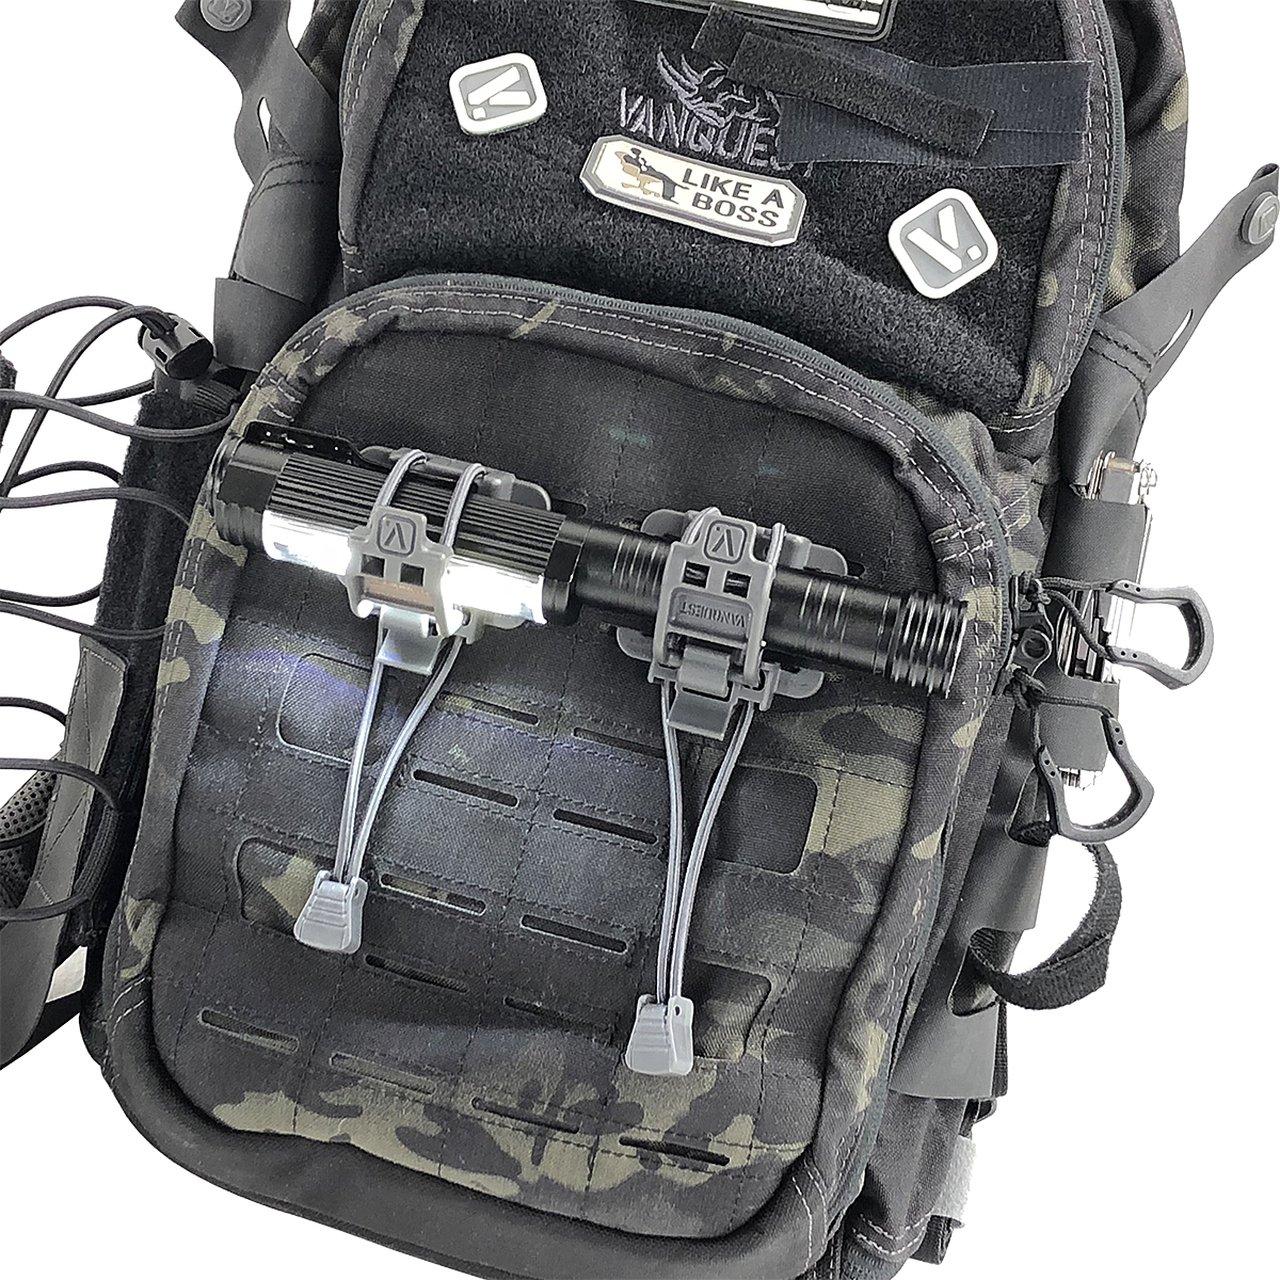 ELASTO Gear Locks (2-Pack) – Black